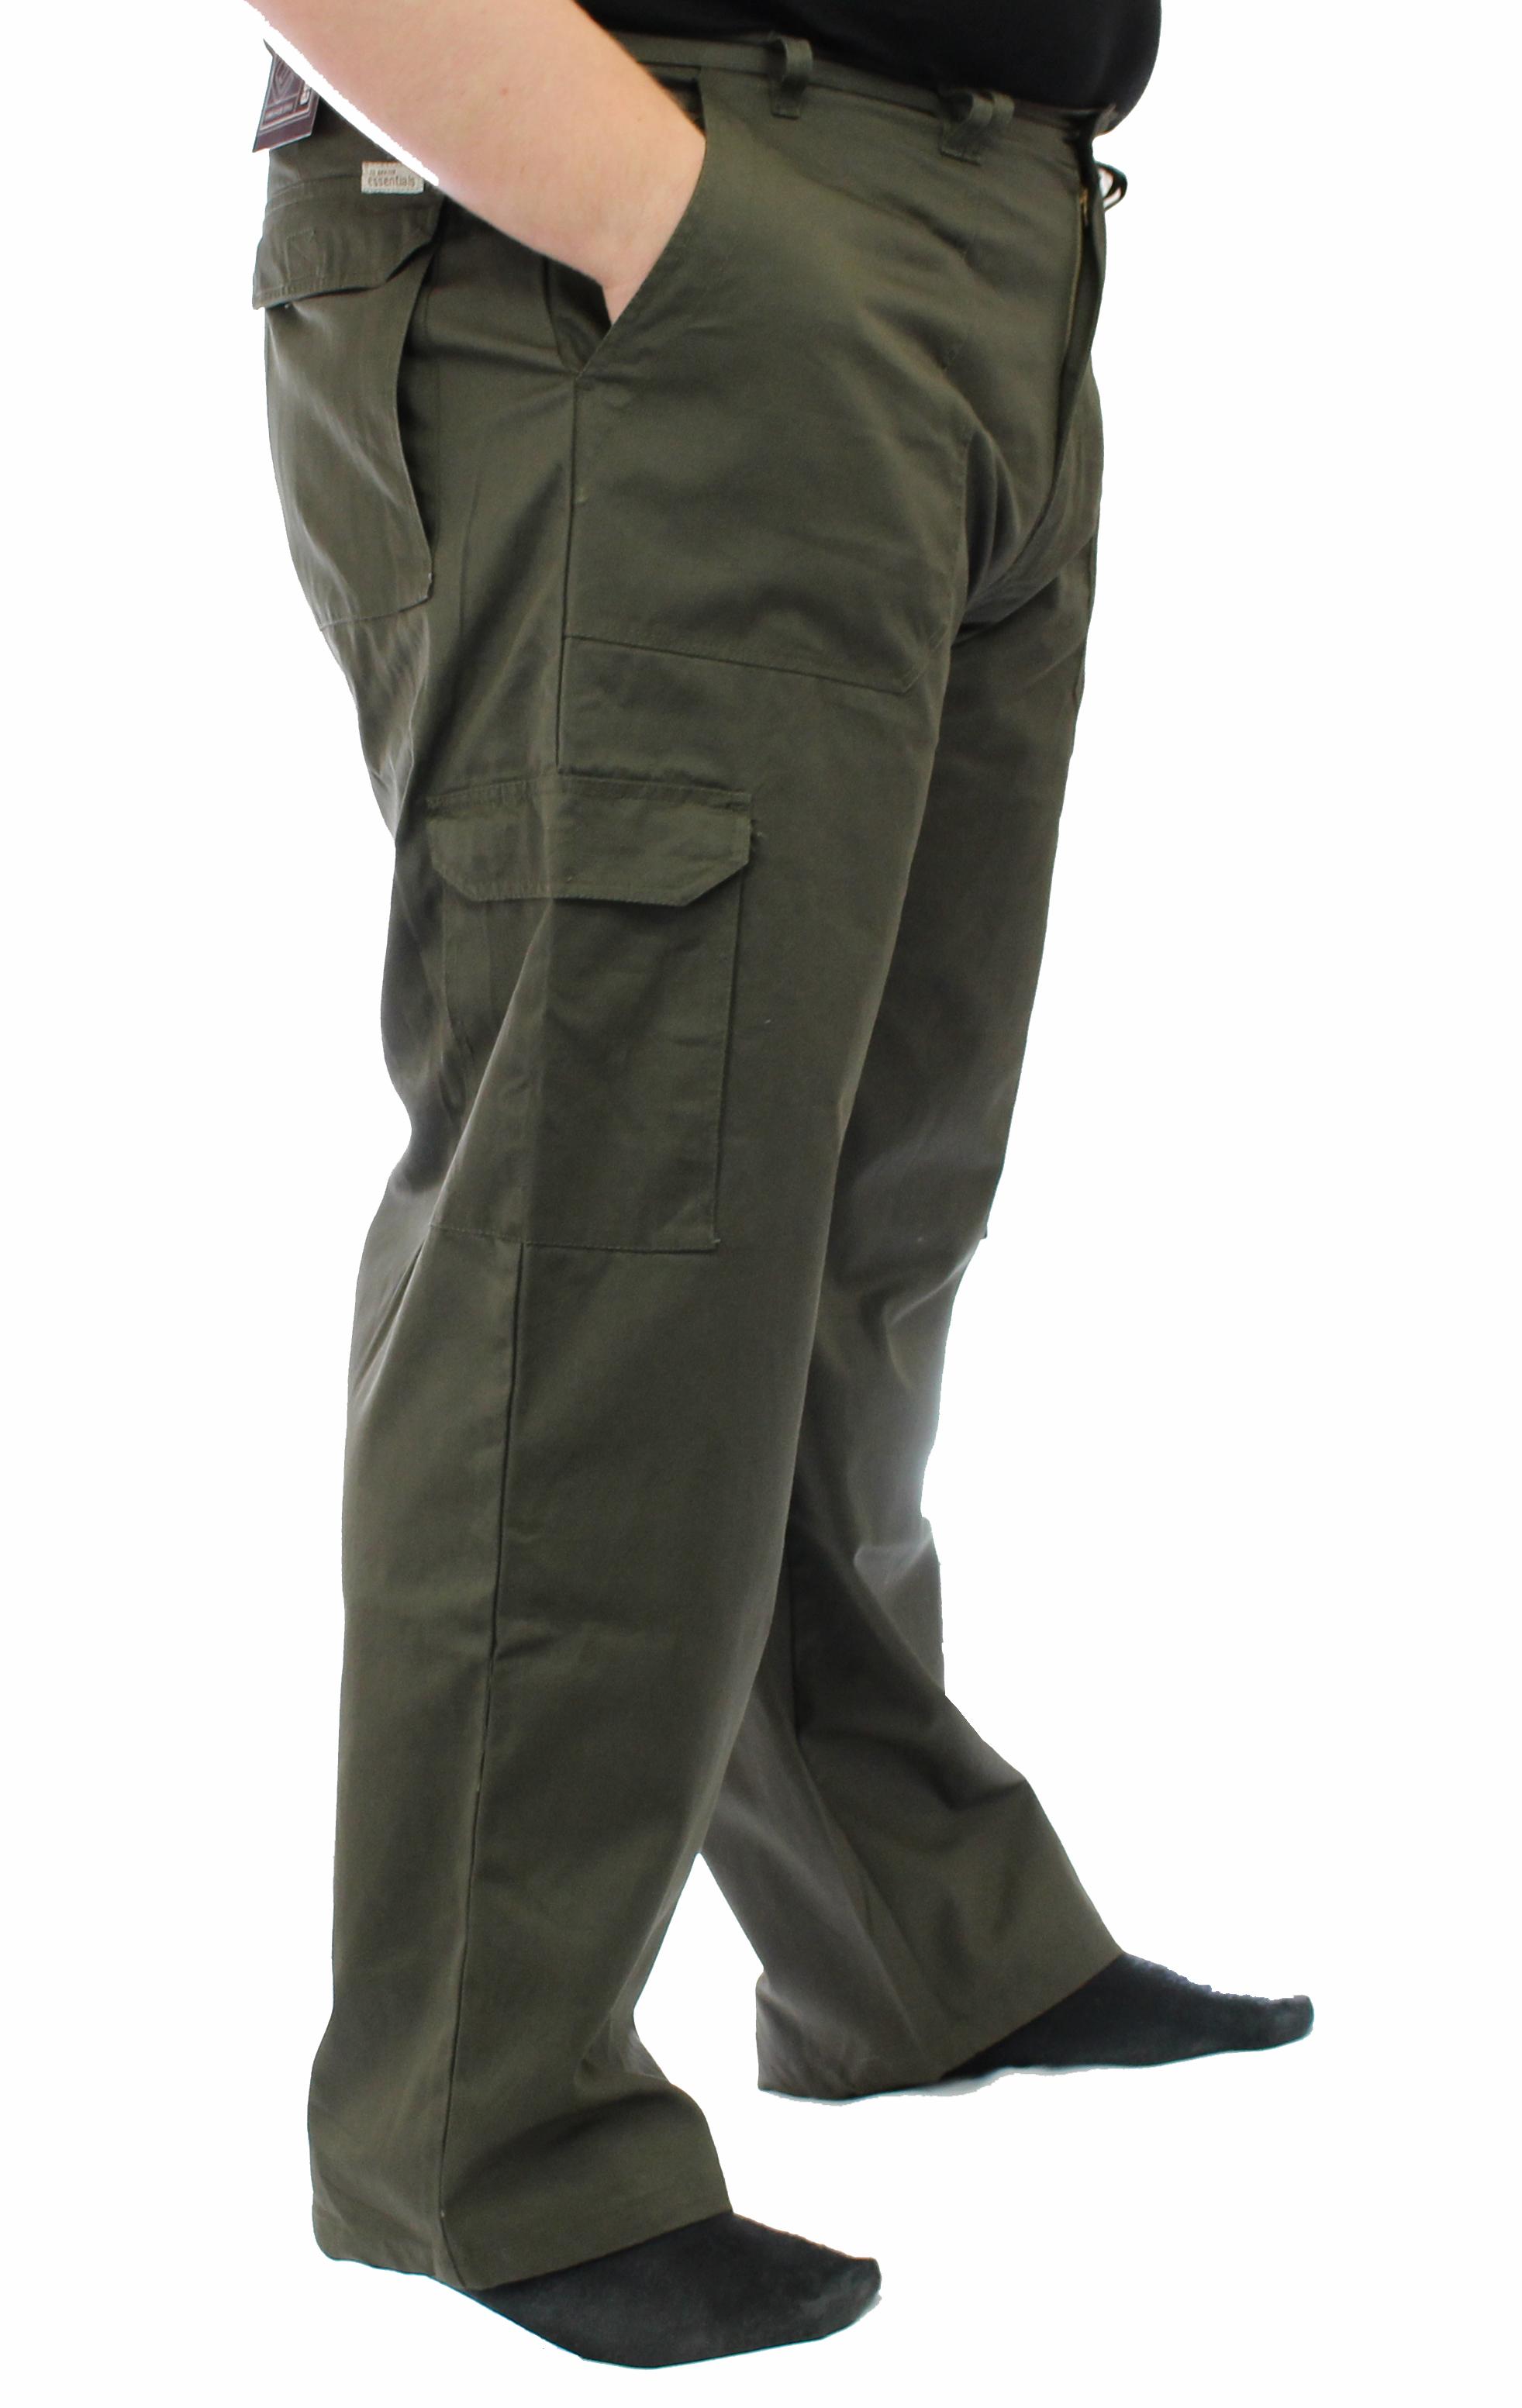 "Ed Baxter Victory - Heavy Duty Cargo Combat Trousers - Khaki - 54"" Waist, 34"" Leg"